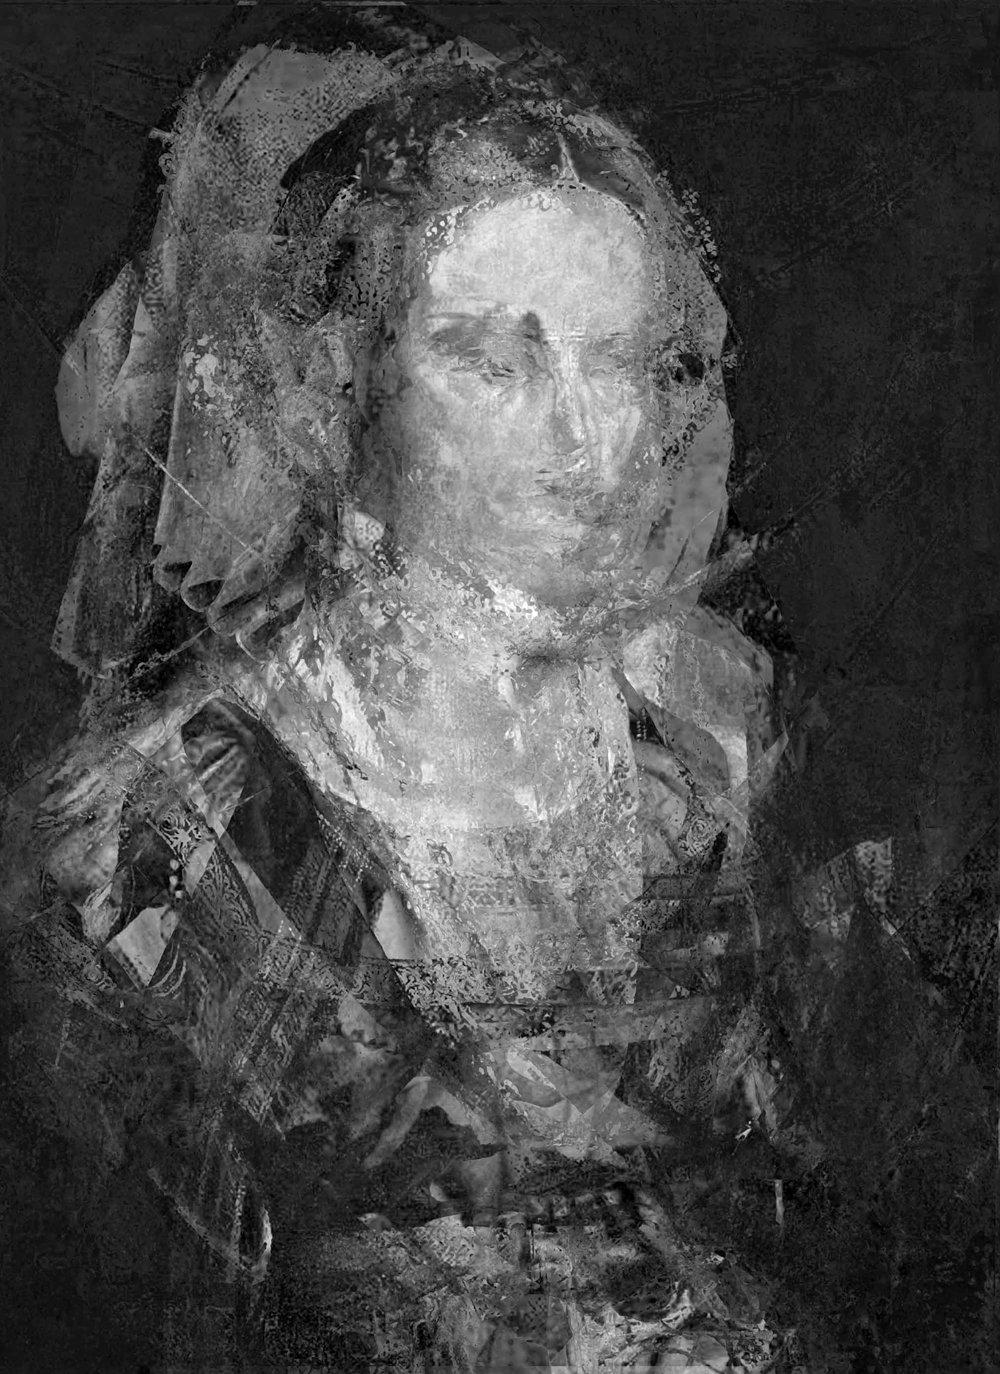 renaissance-portraits-01bw.jpg